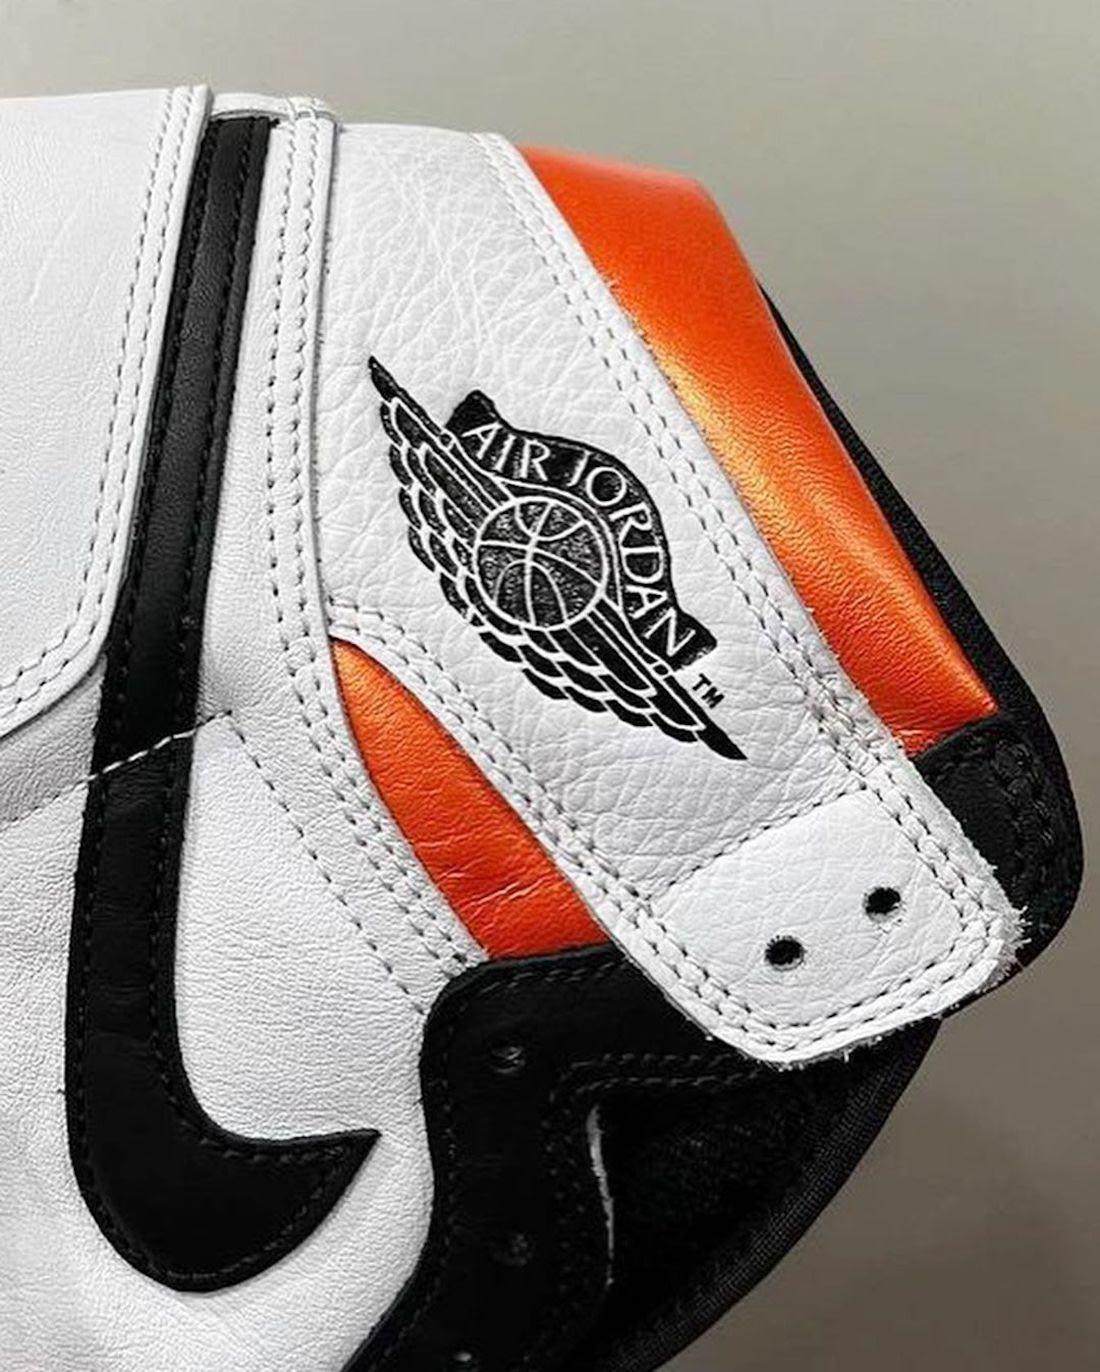 Air Jordan 1 High OG Electro Orange 555088-180 Release Date